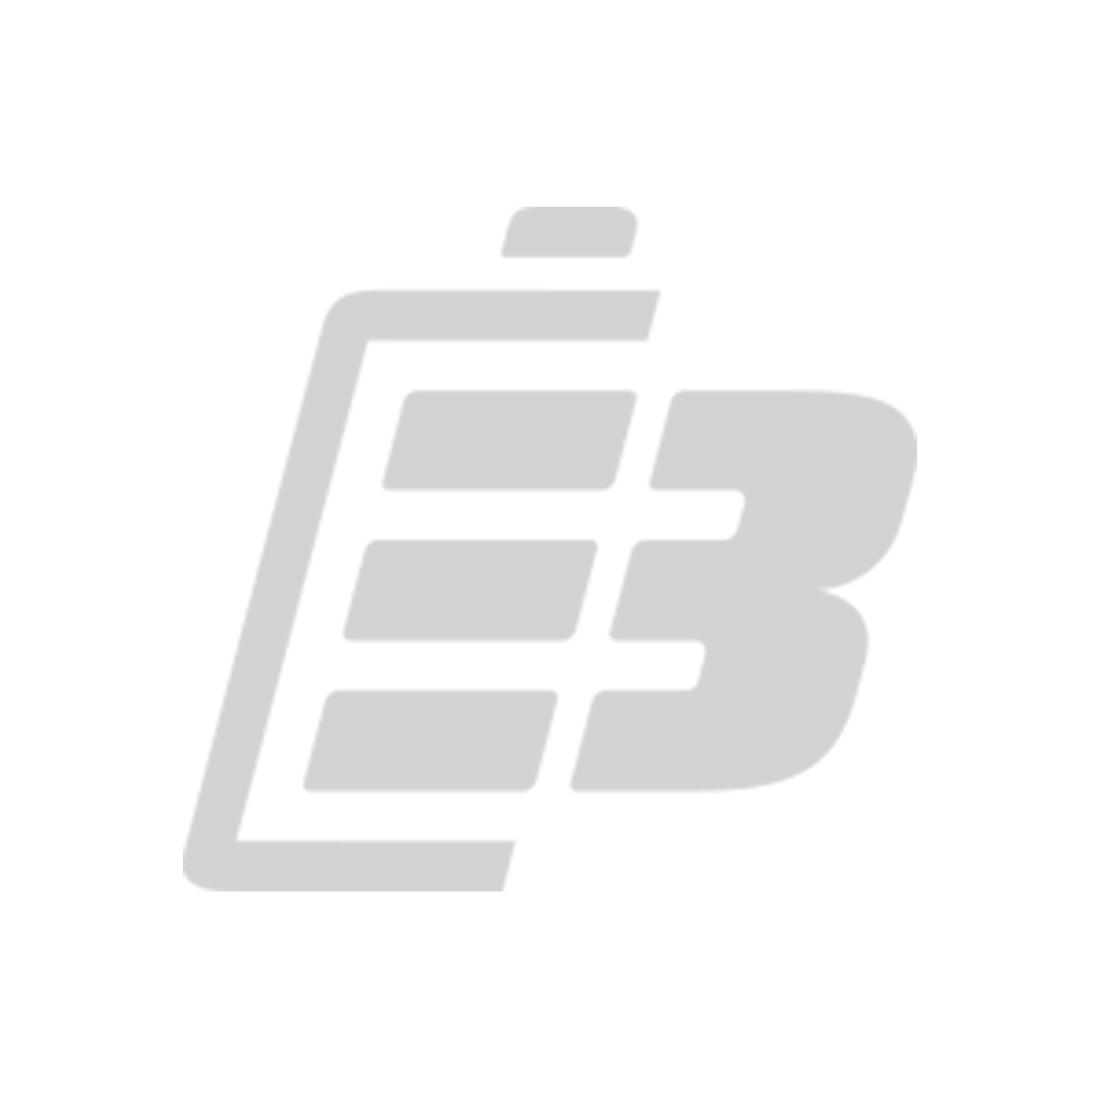 Barcode scanner battery Symbol MC65_1